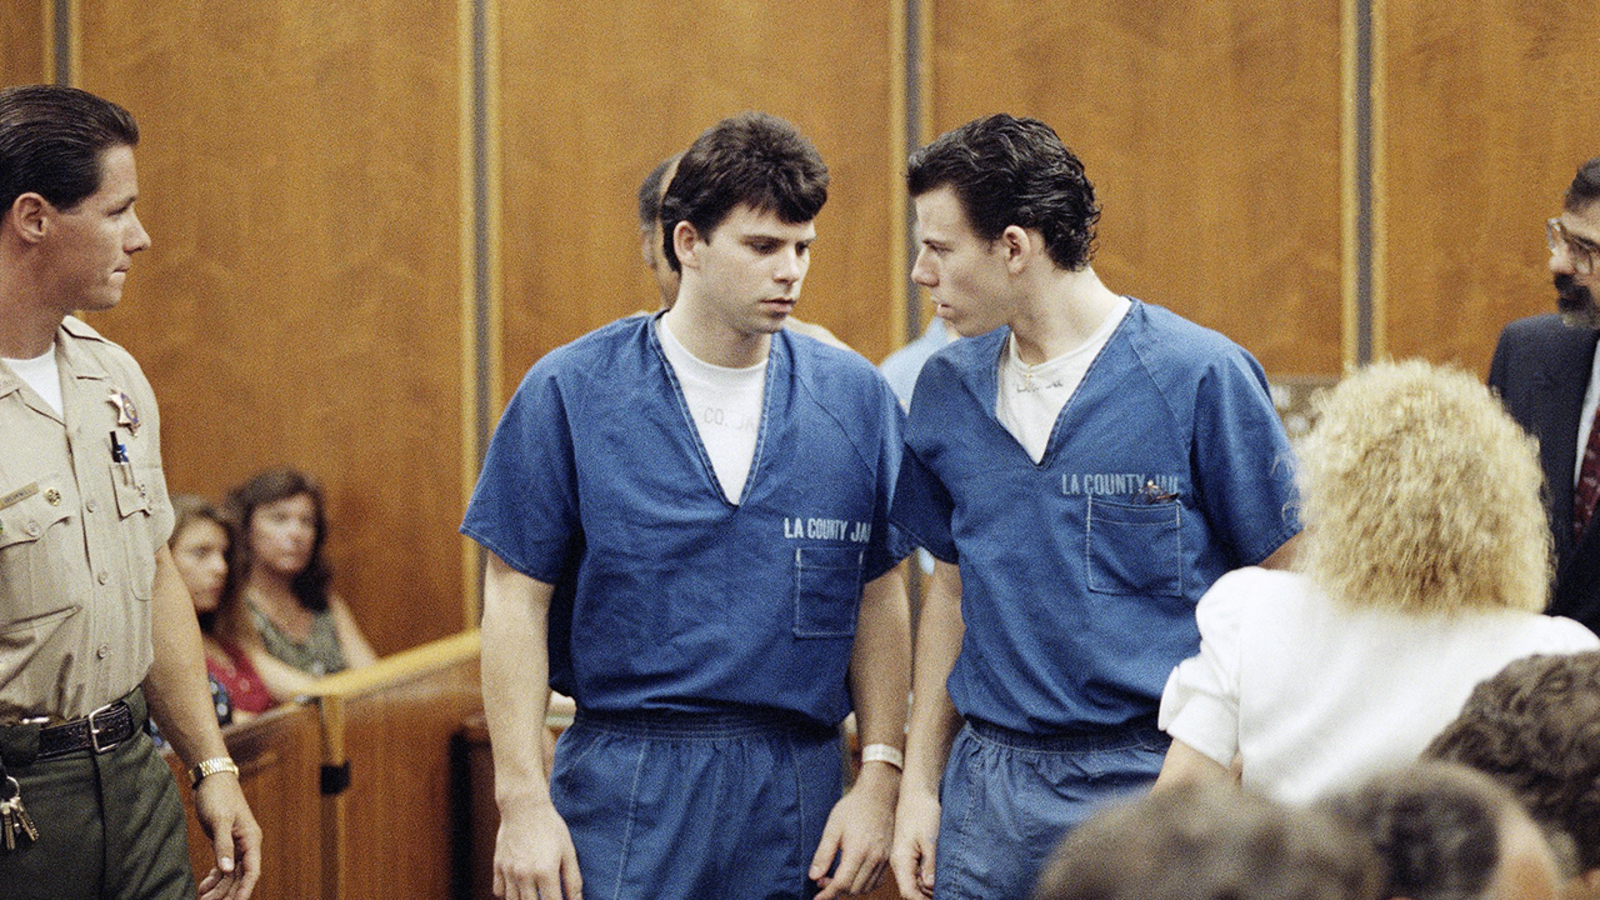 Menendez brothers case back in spotlight thanks to TikTok teens: Reporter's notebook